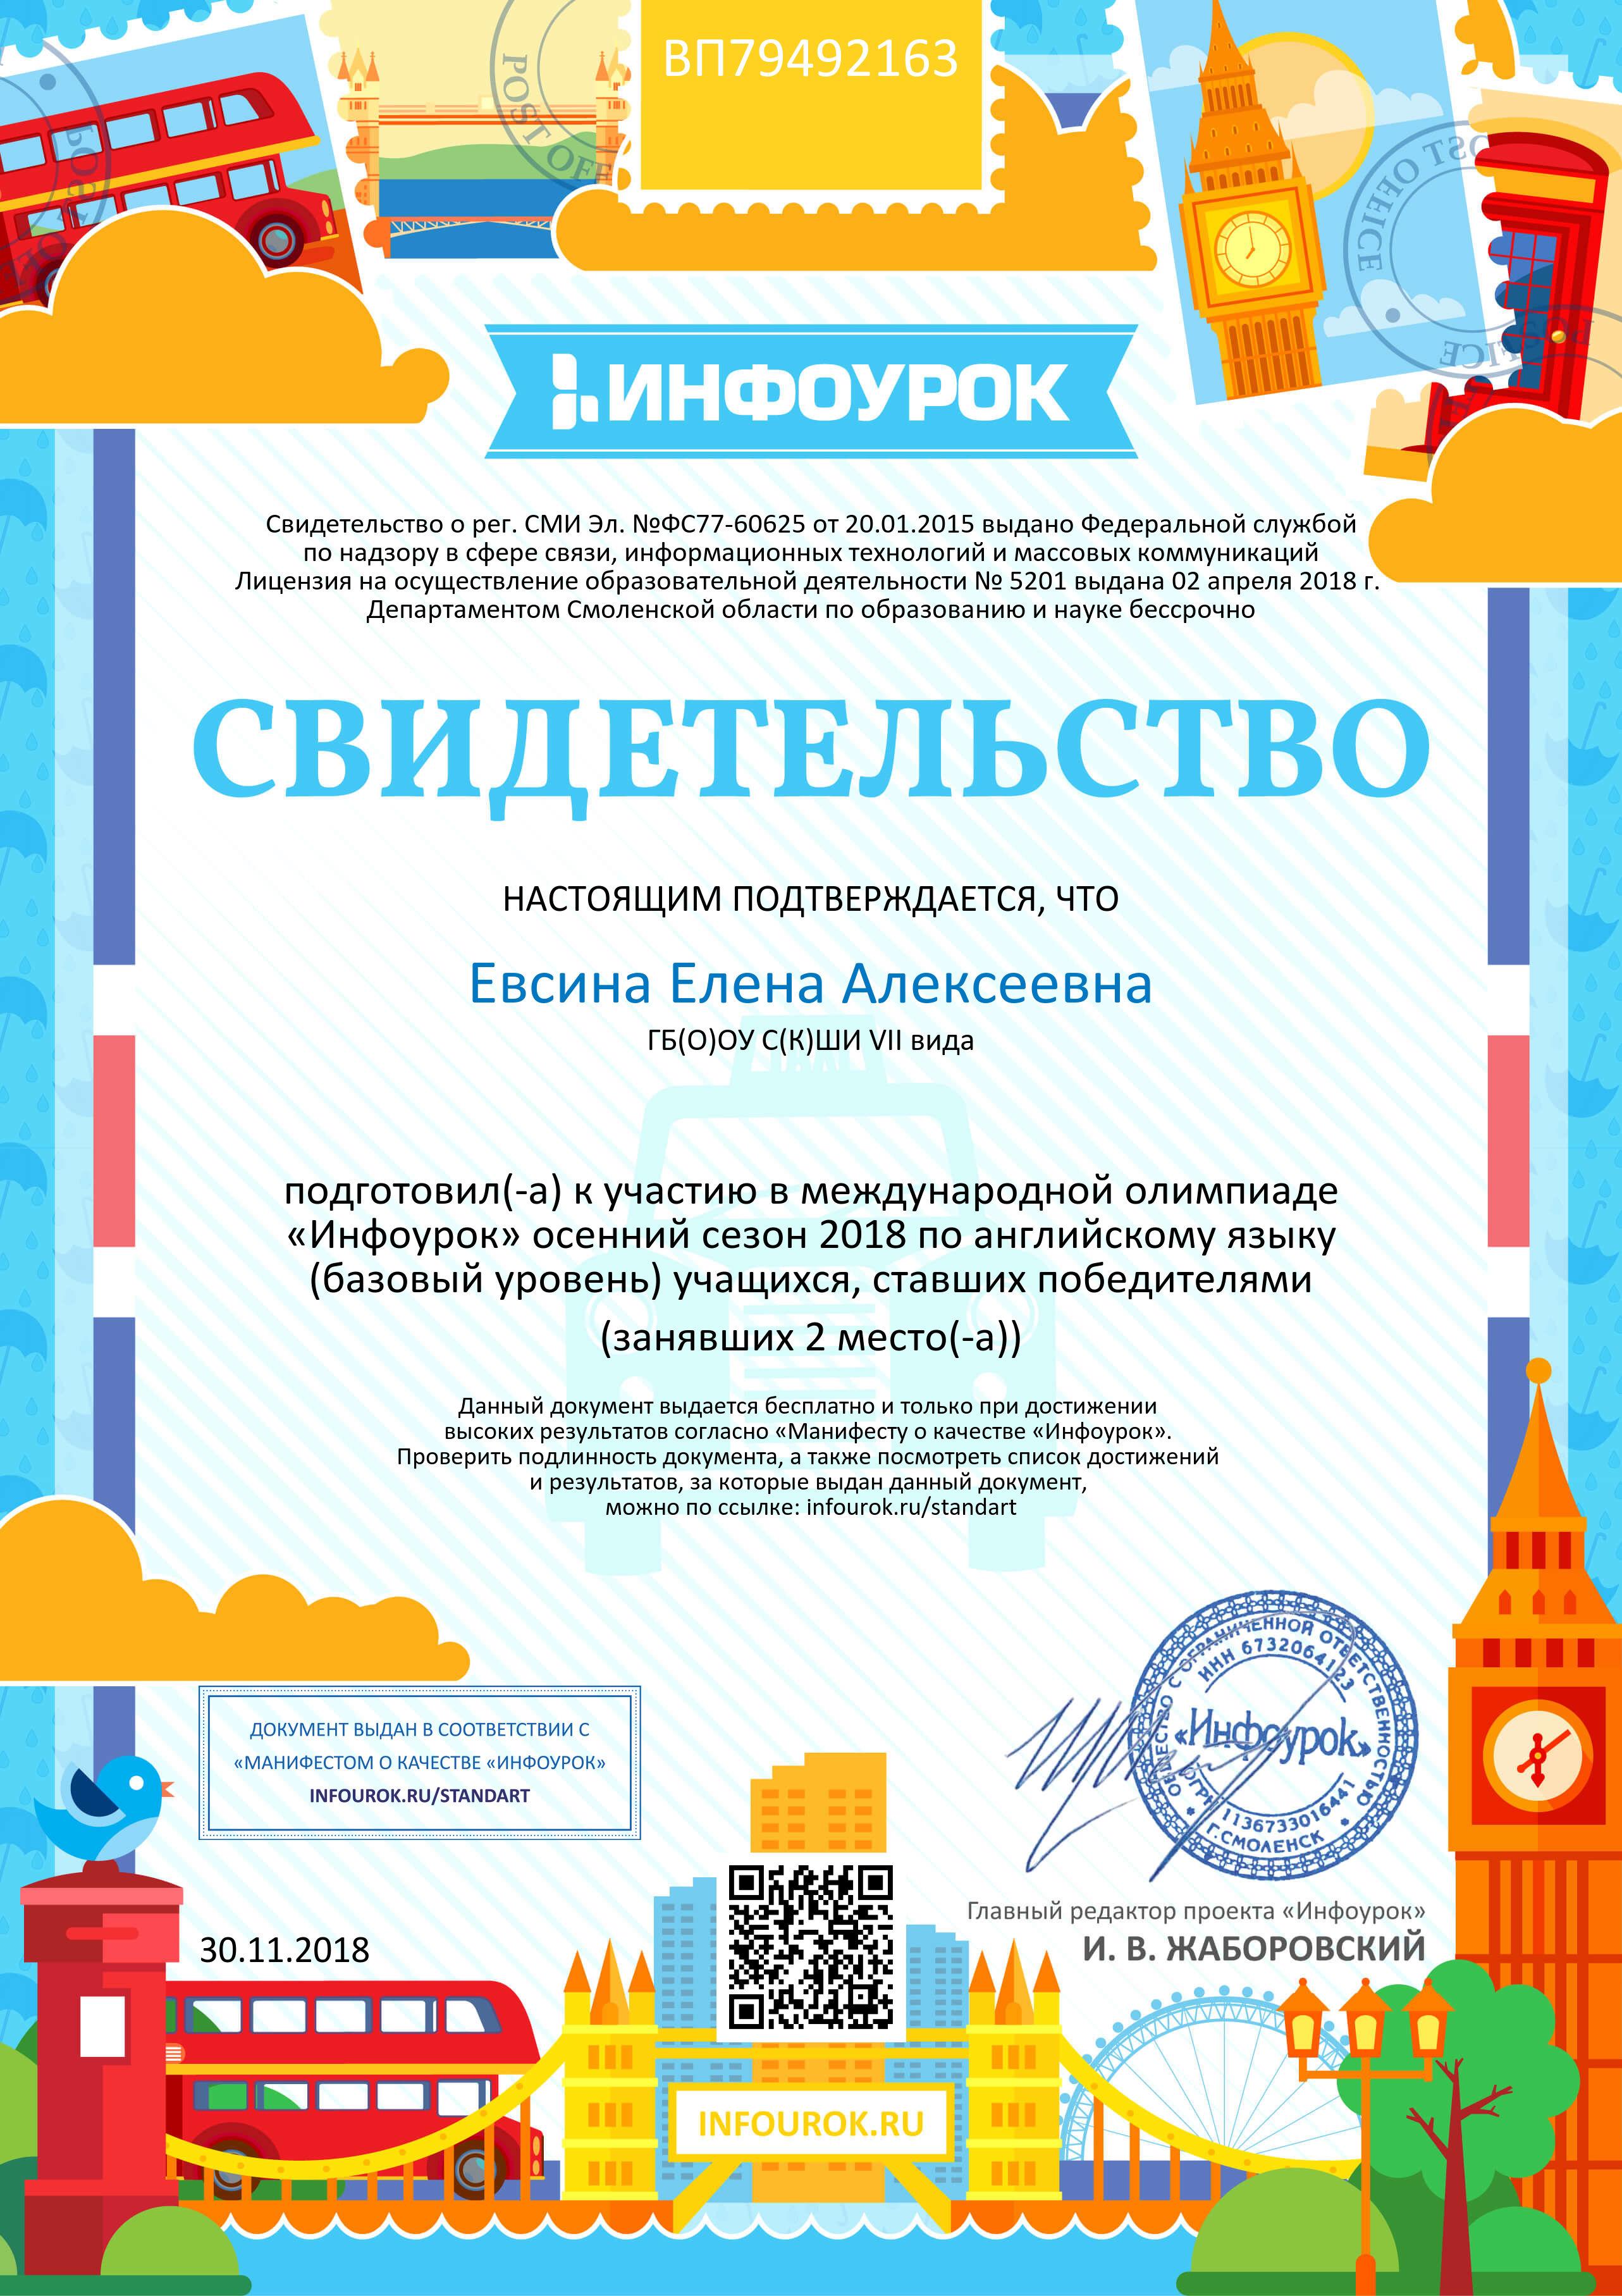 Итоги международной онлайн-олимпиады «Инфоурок»